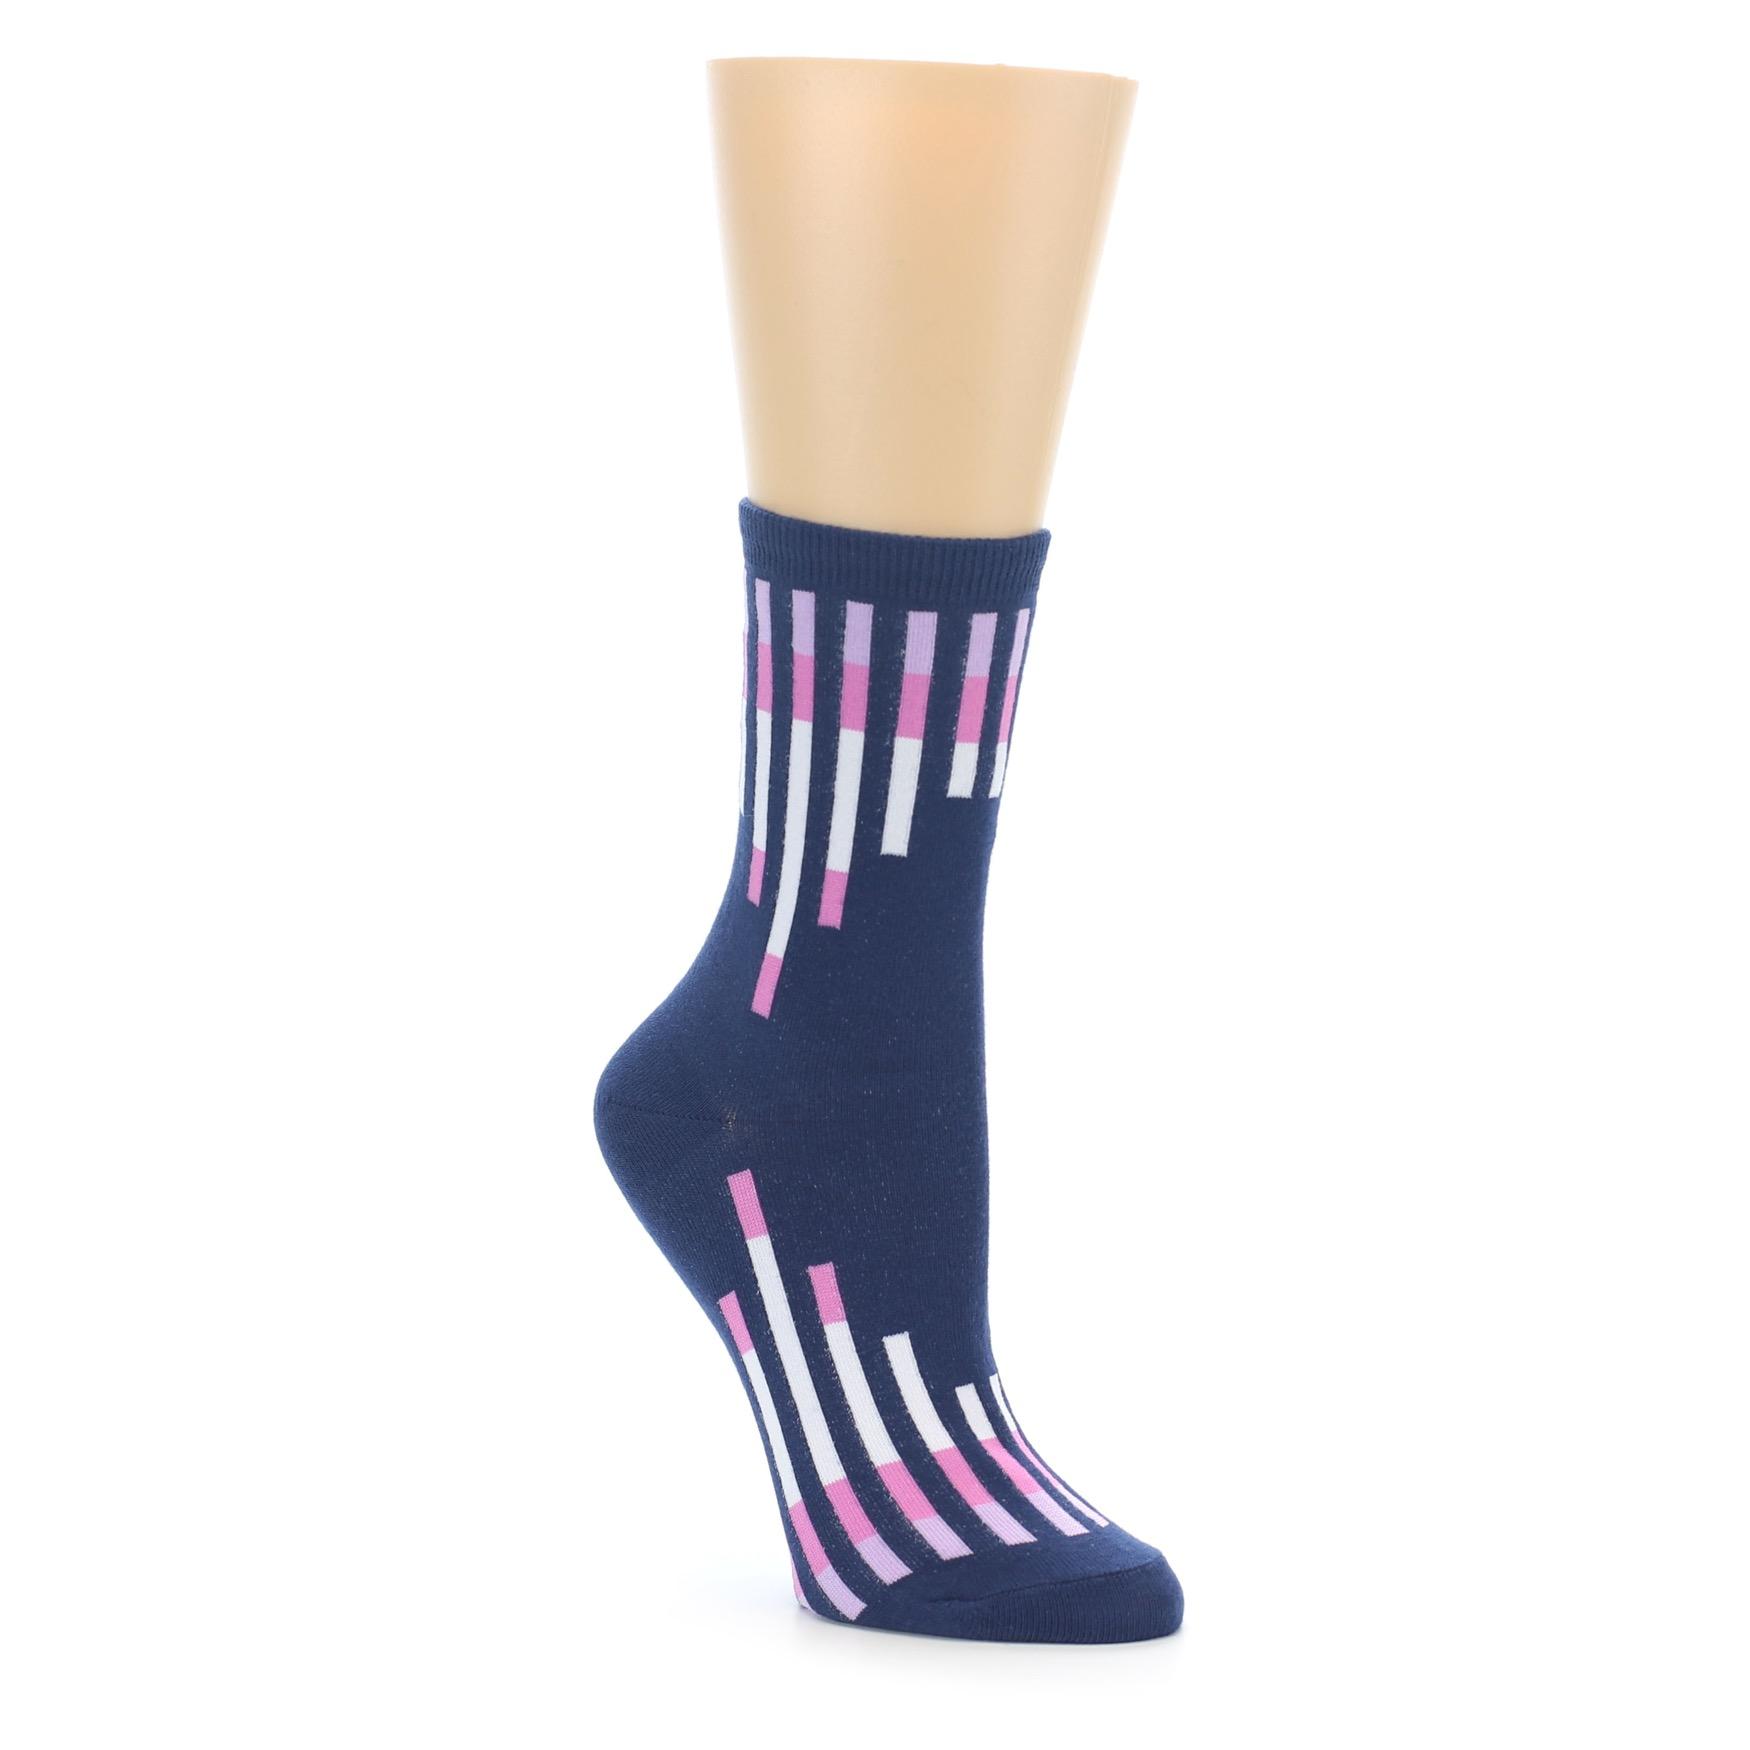 6d59ceb838893 Navy Pink Vertical Stripes Women's Dress Socks | boldSOCKS